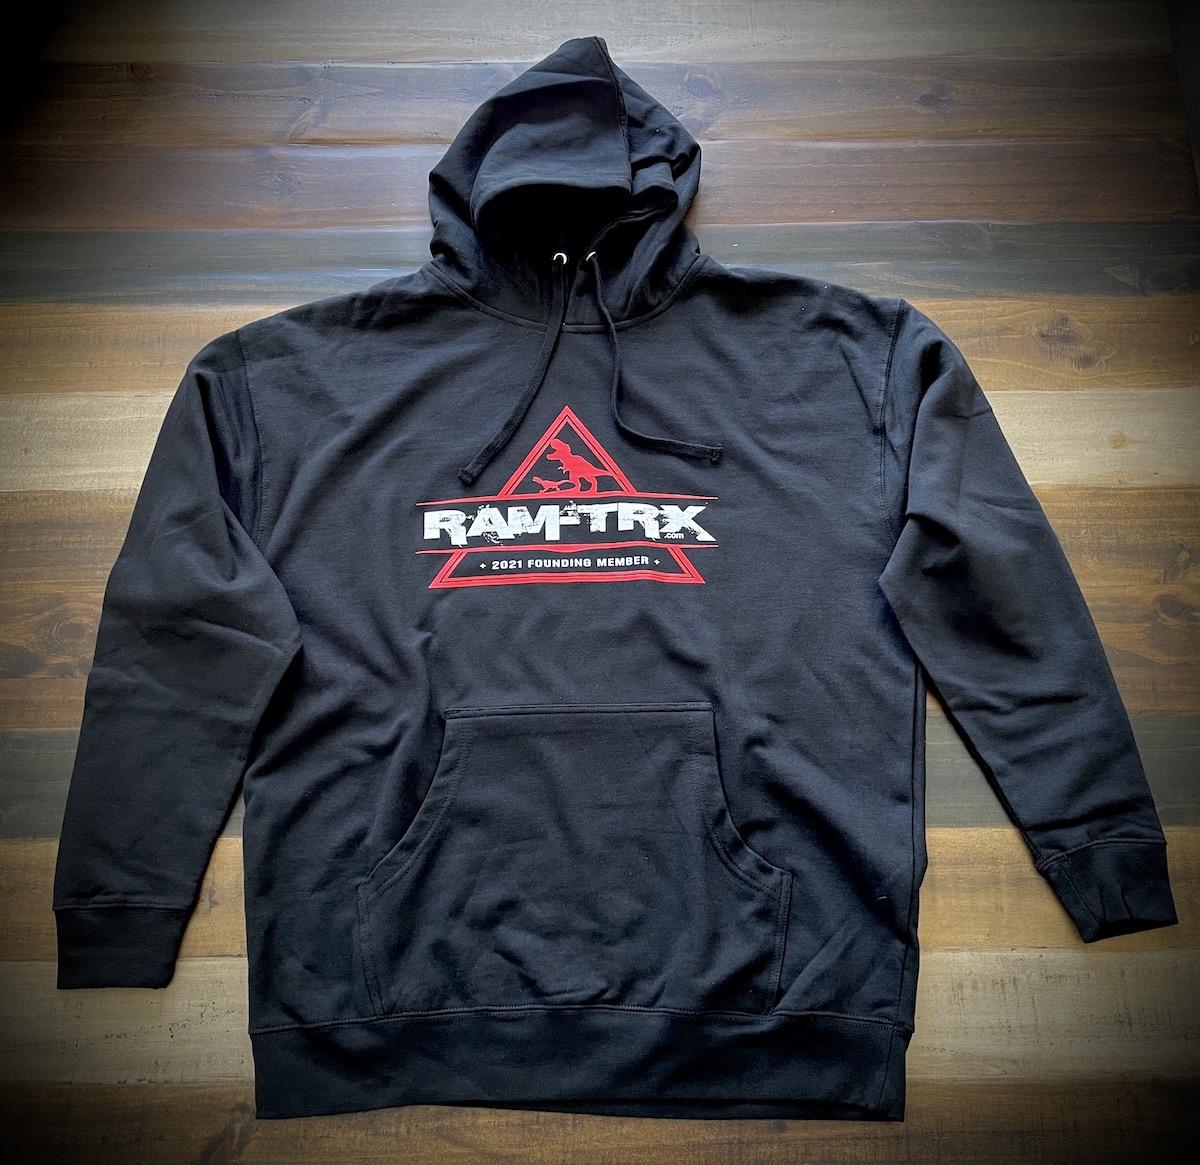 ram-trx-hoodie1.jpeg